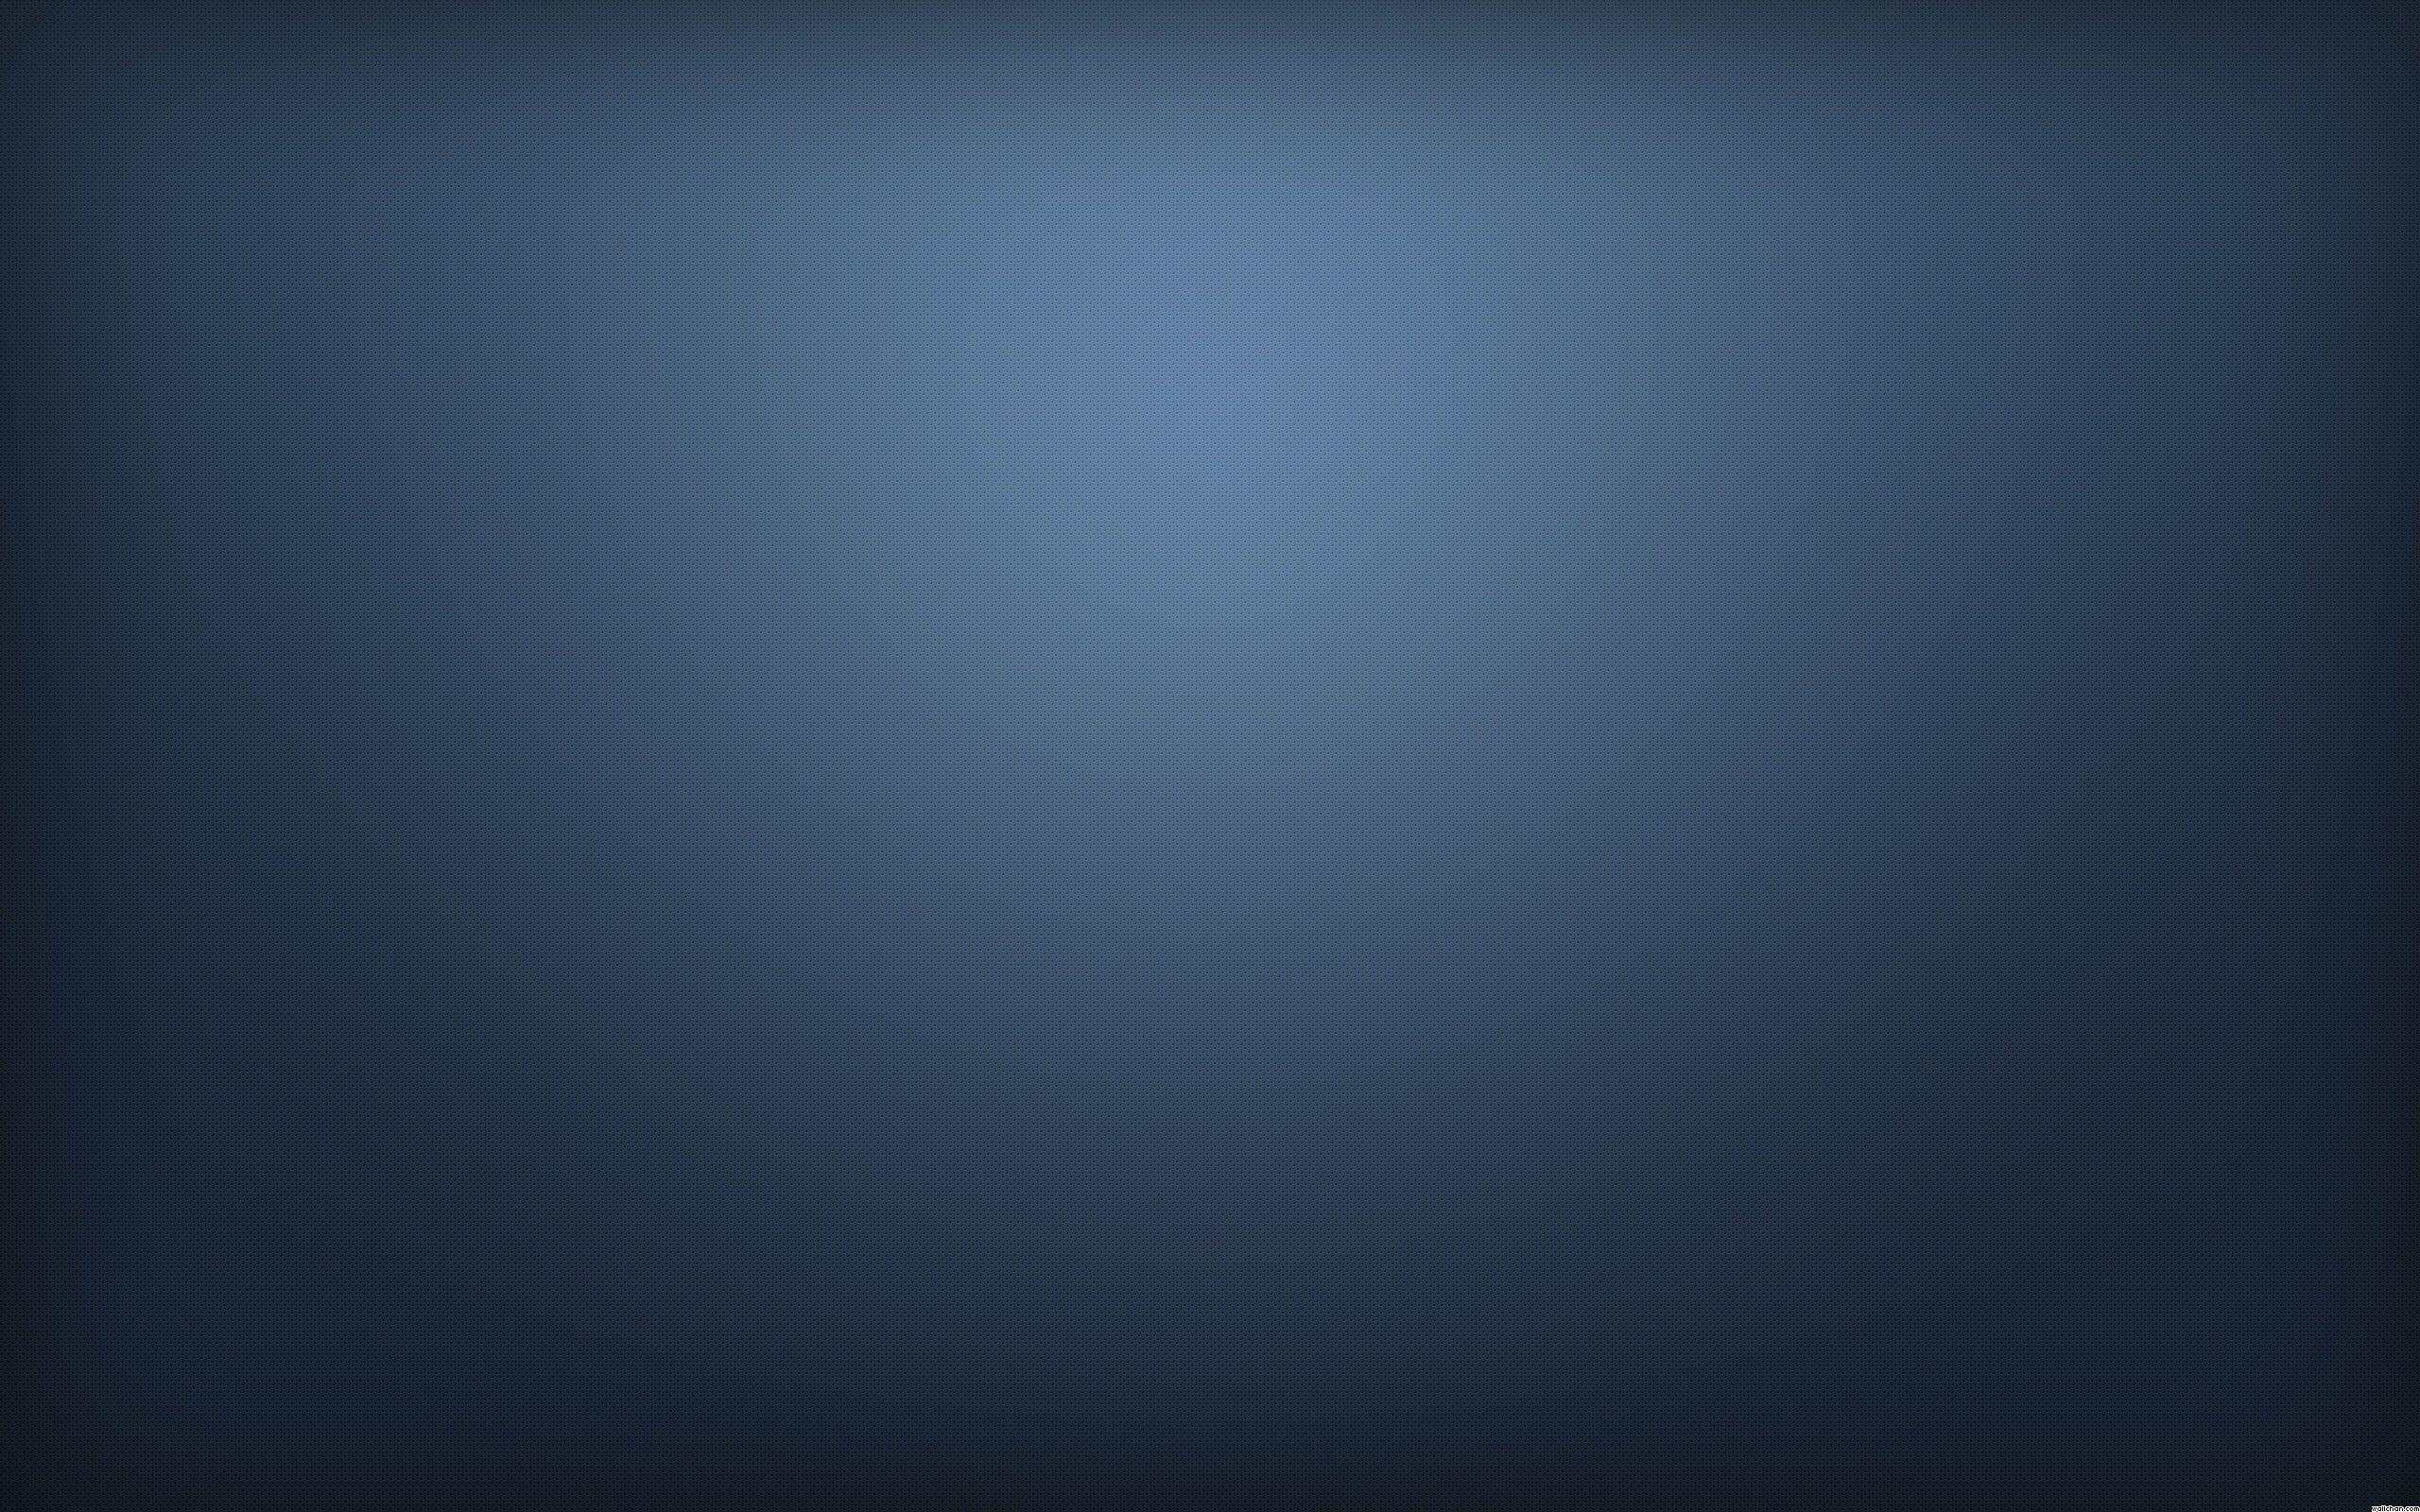 midnight blue plain wallpaper